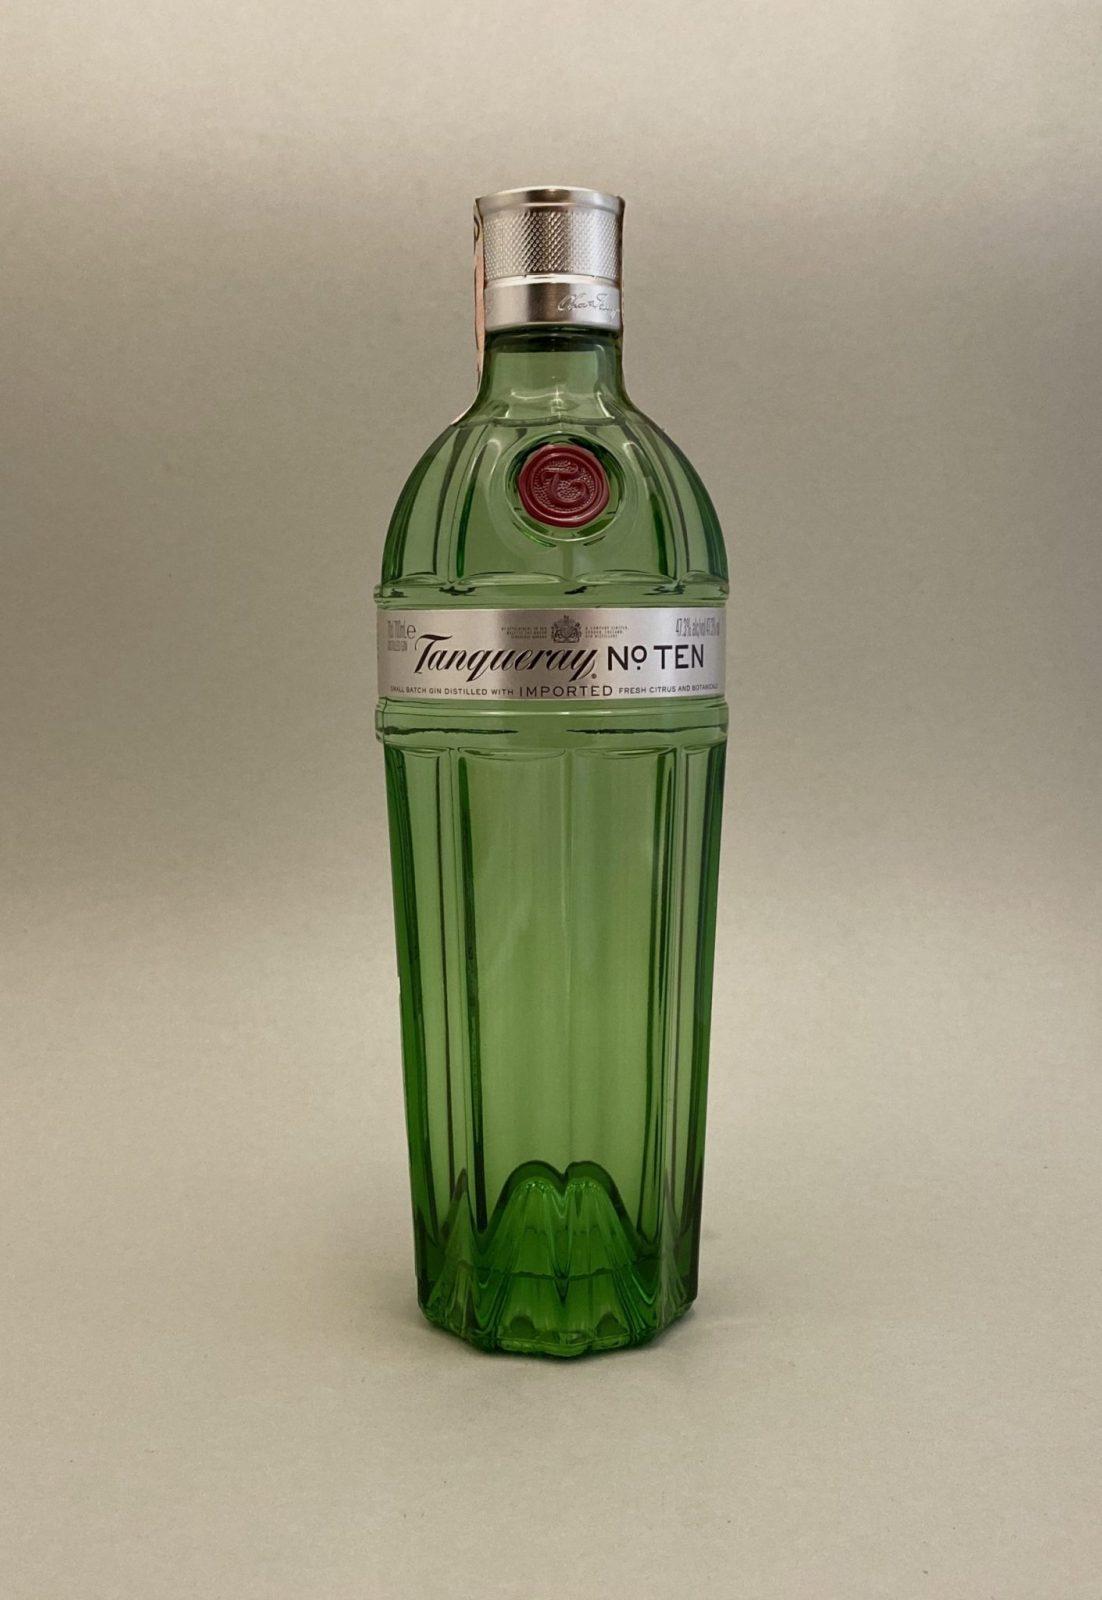 Tanqueray No 10 47,3%, Bottleshop Sunny wines slnecnice mesto, petrzalka, Gin, rozvoz alkoholu, eshop